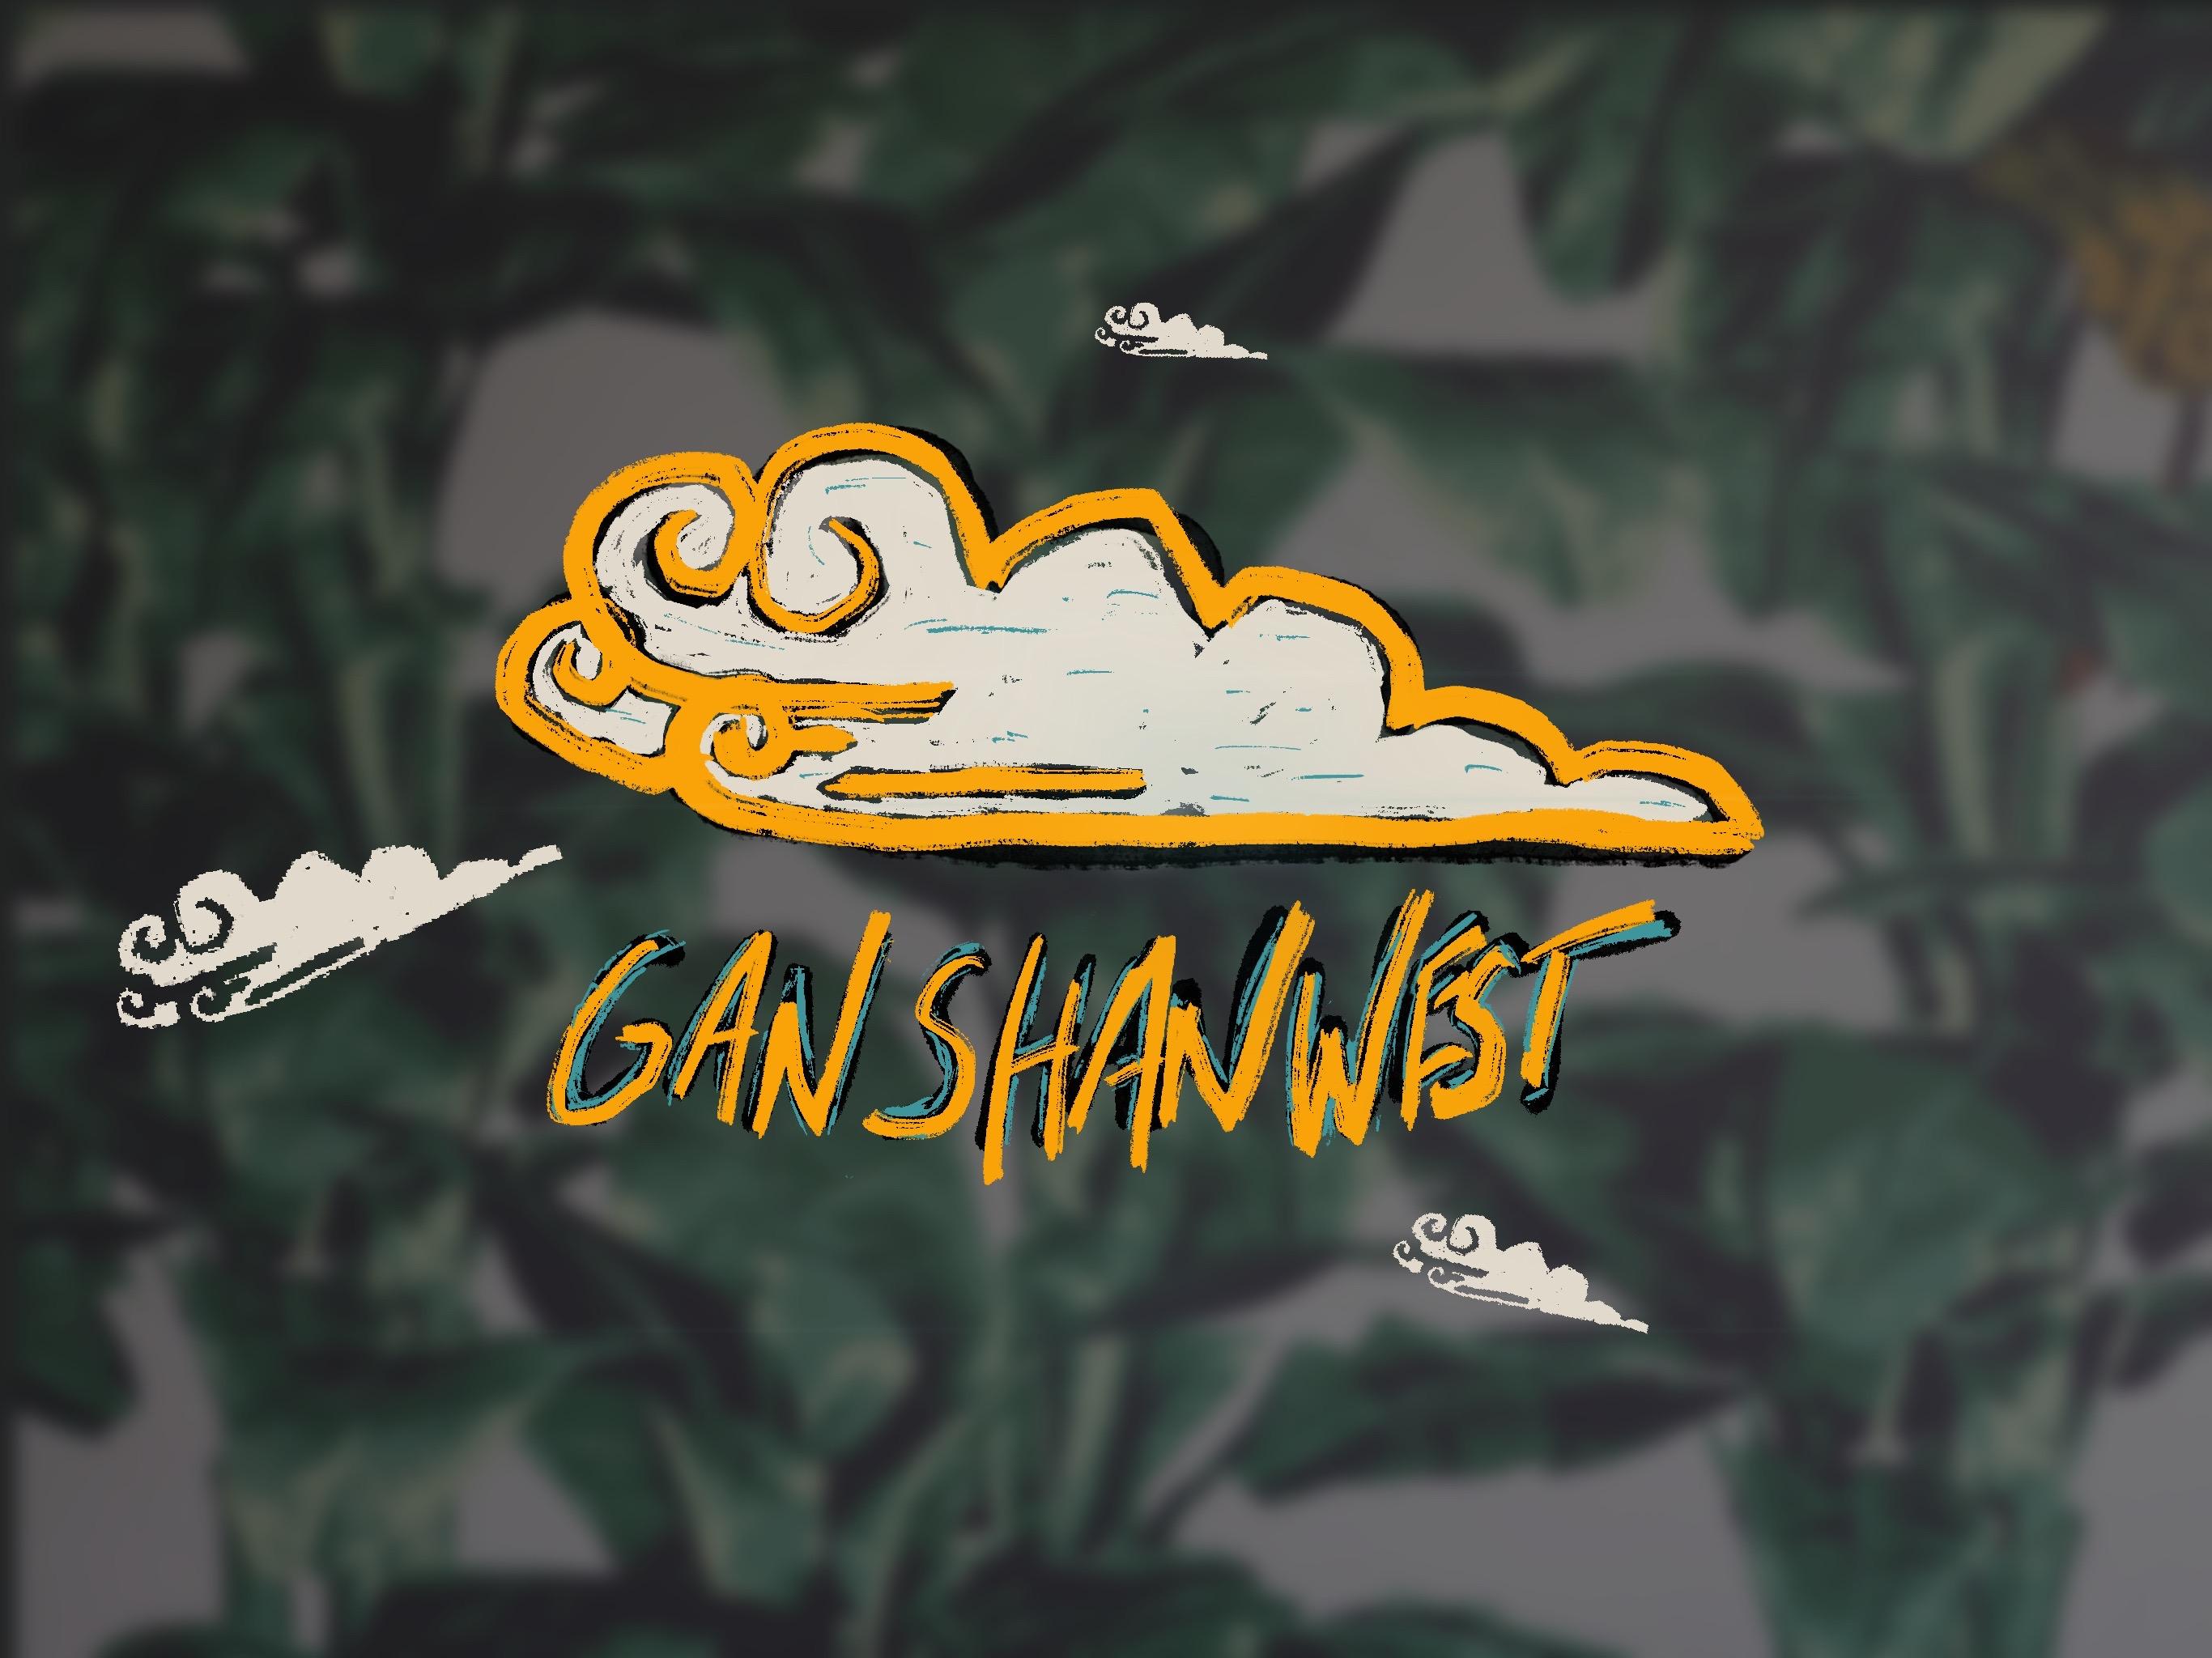 Gan Shan West Home